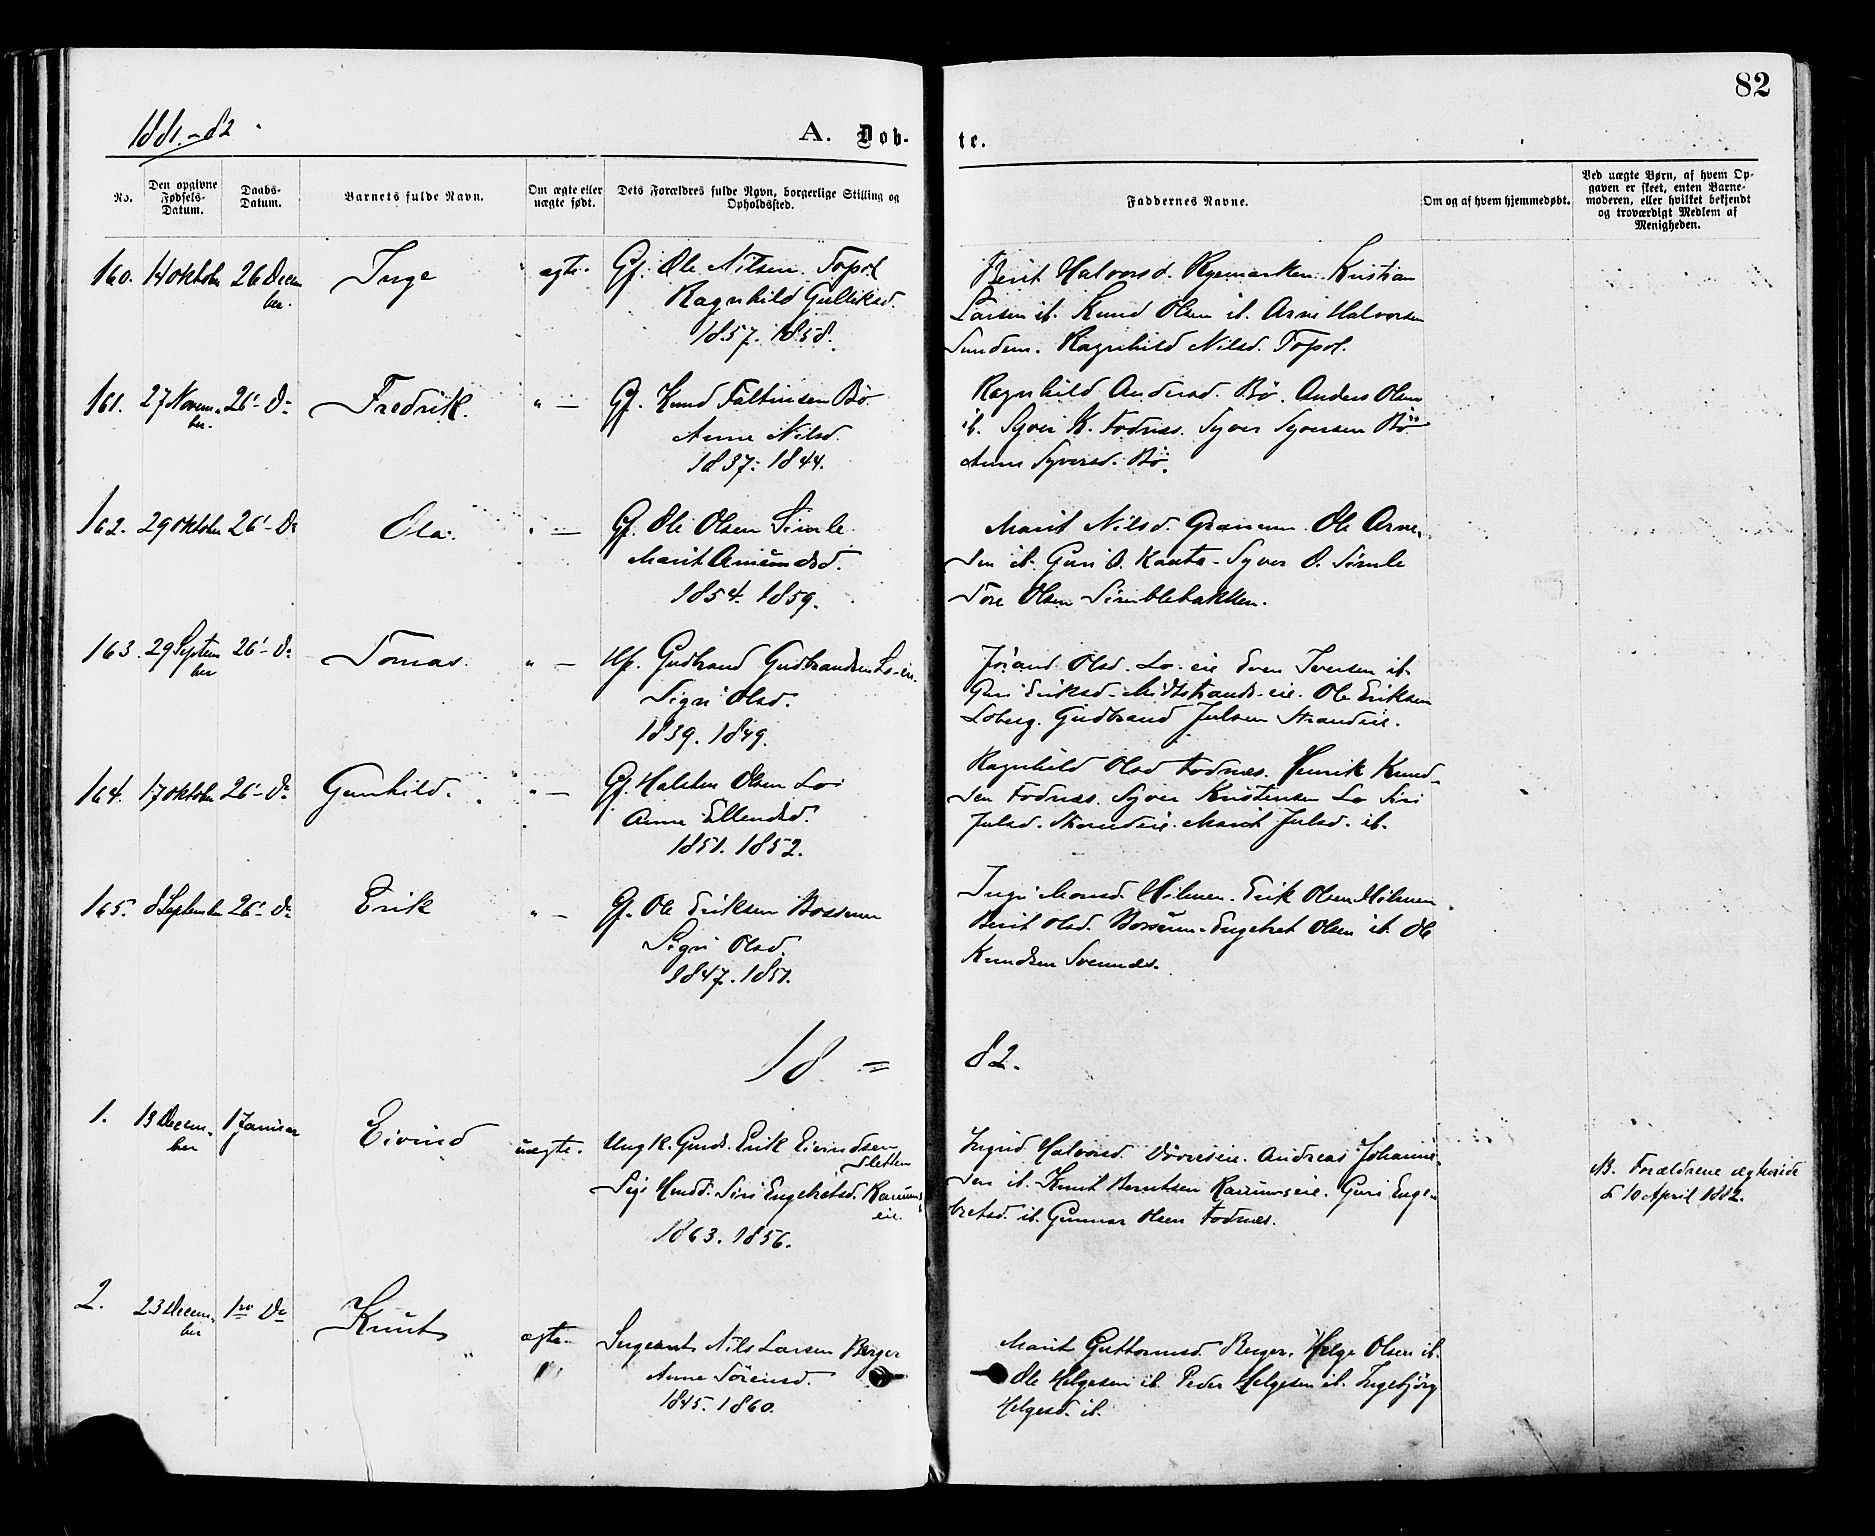 SAH, Nord-Aurdal prestekontor, Ministerialbok nr. 9, 1876-1882, s. 82